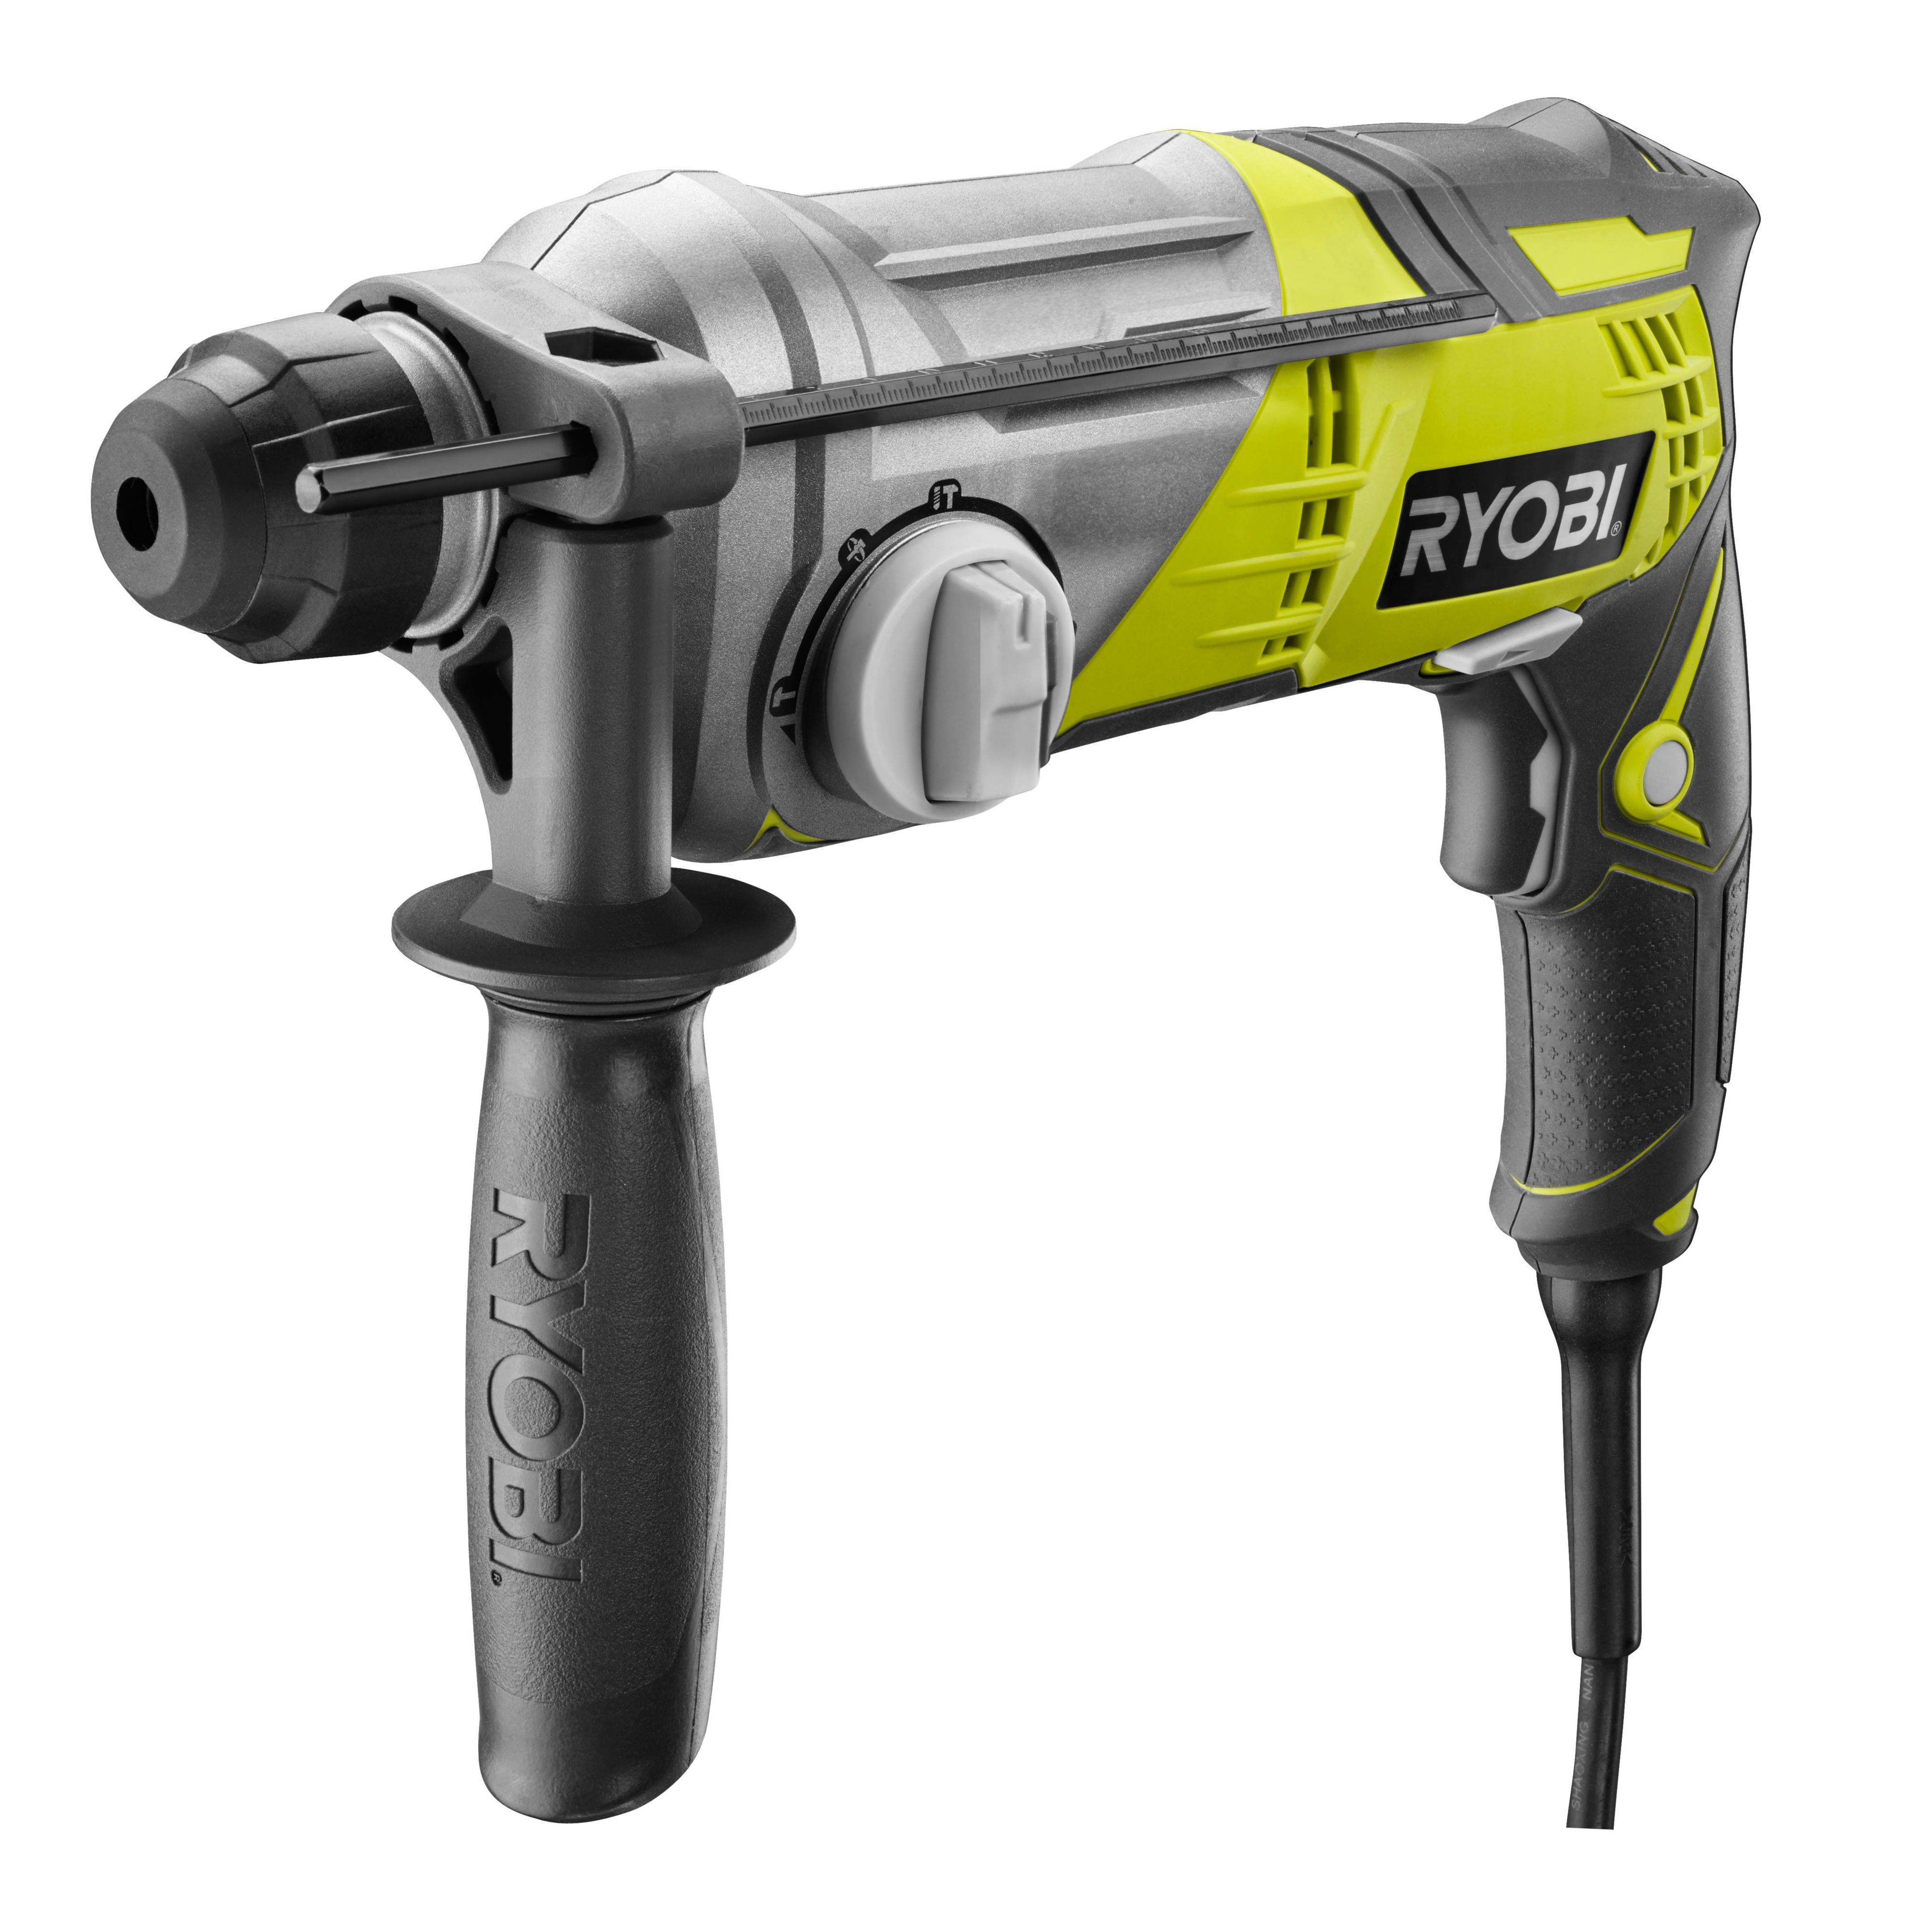 Ryobi 680w 240v Corded Sds Plus Brushed Hammer Drill